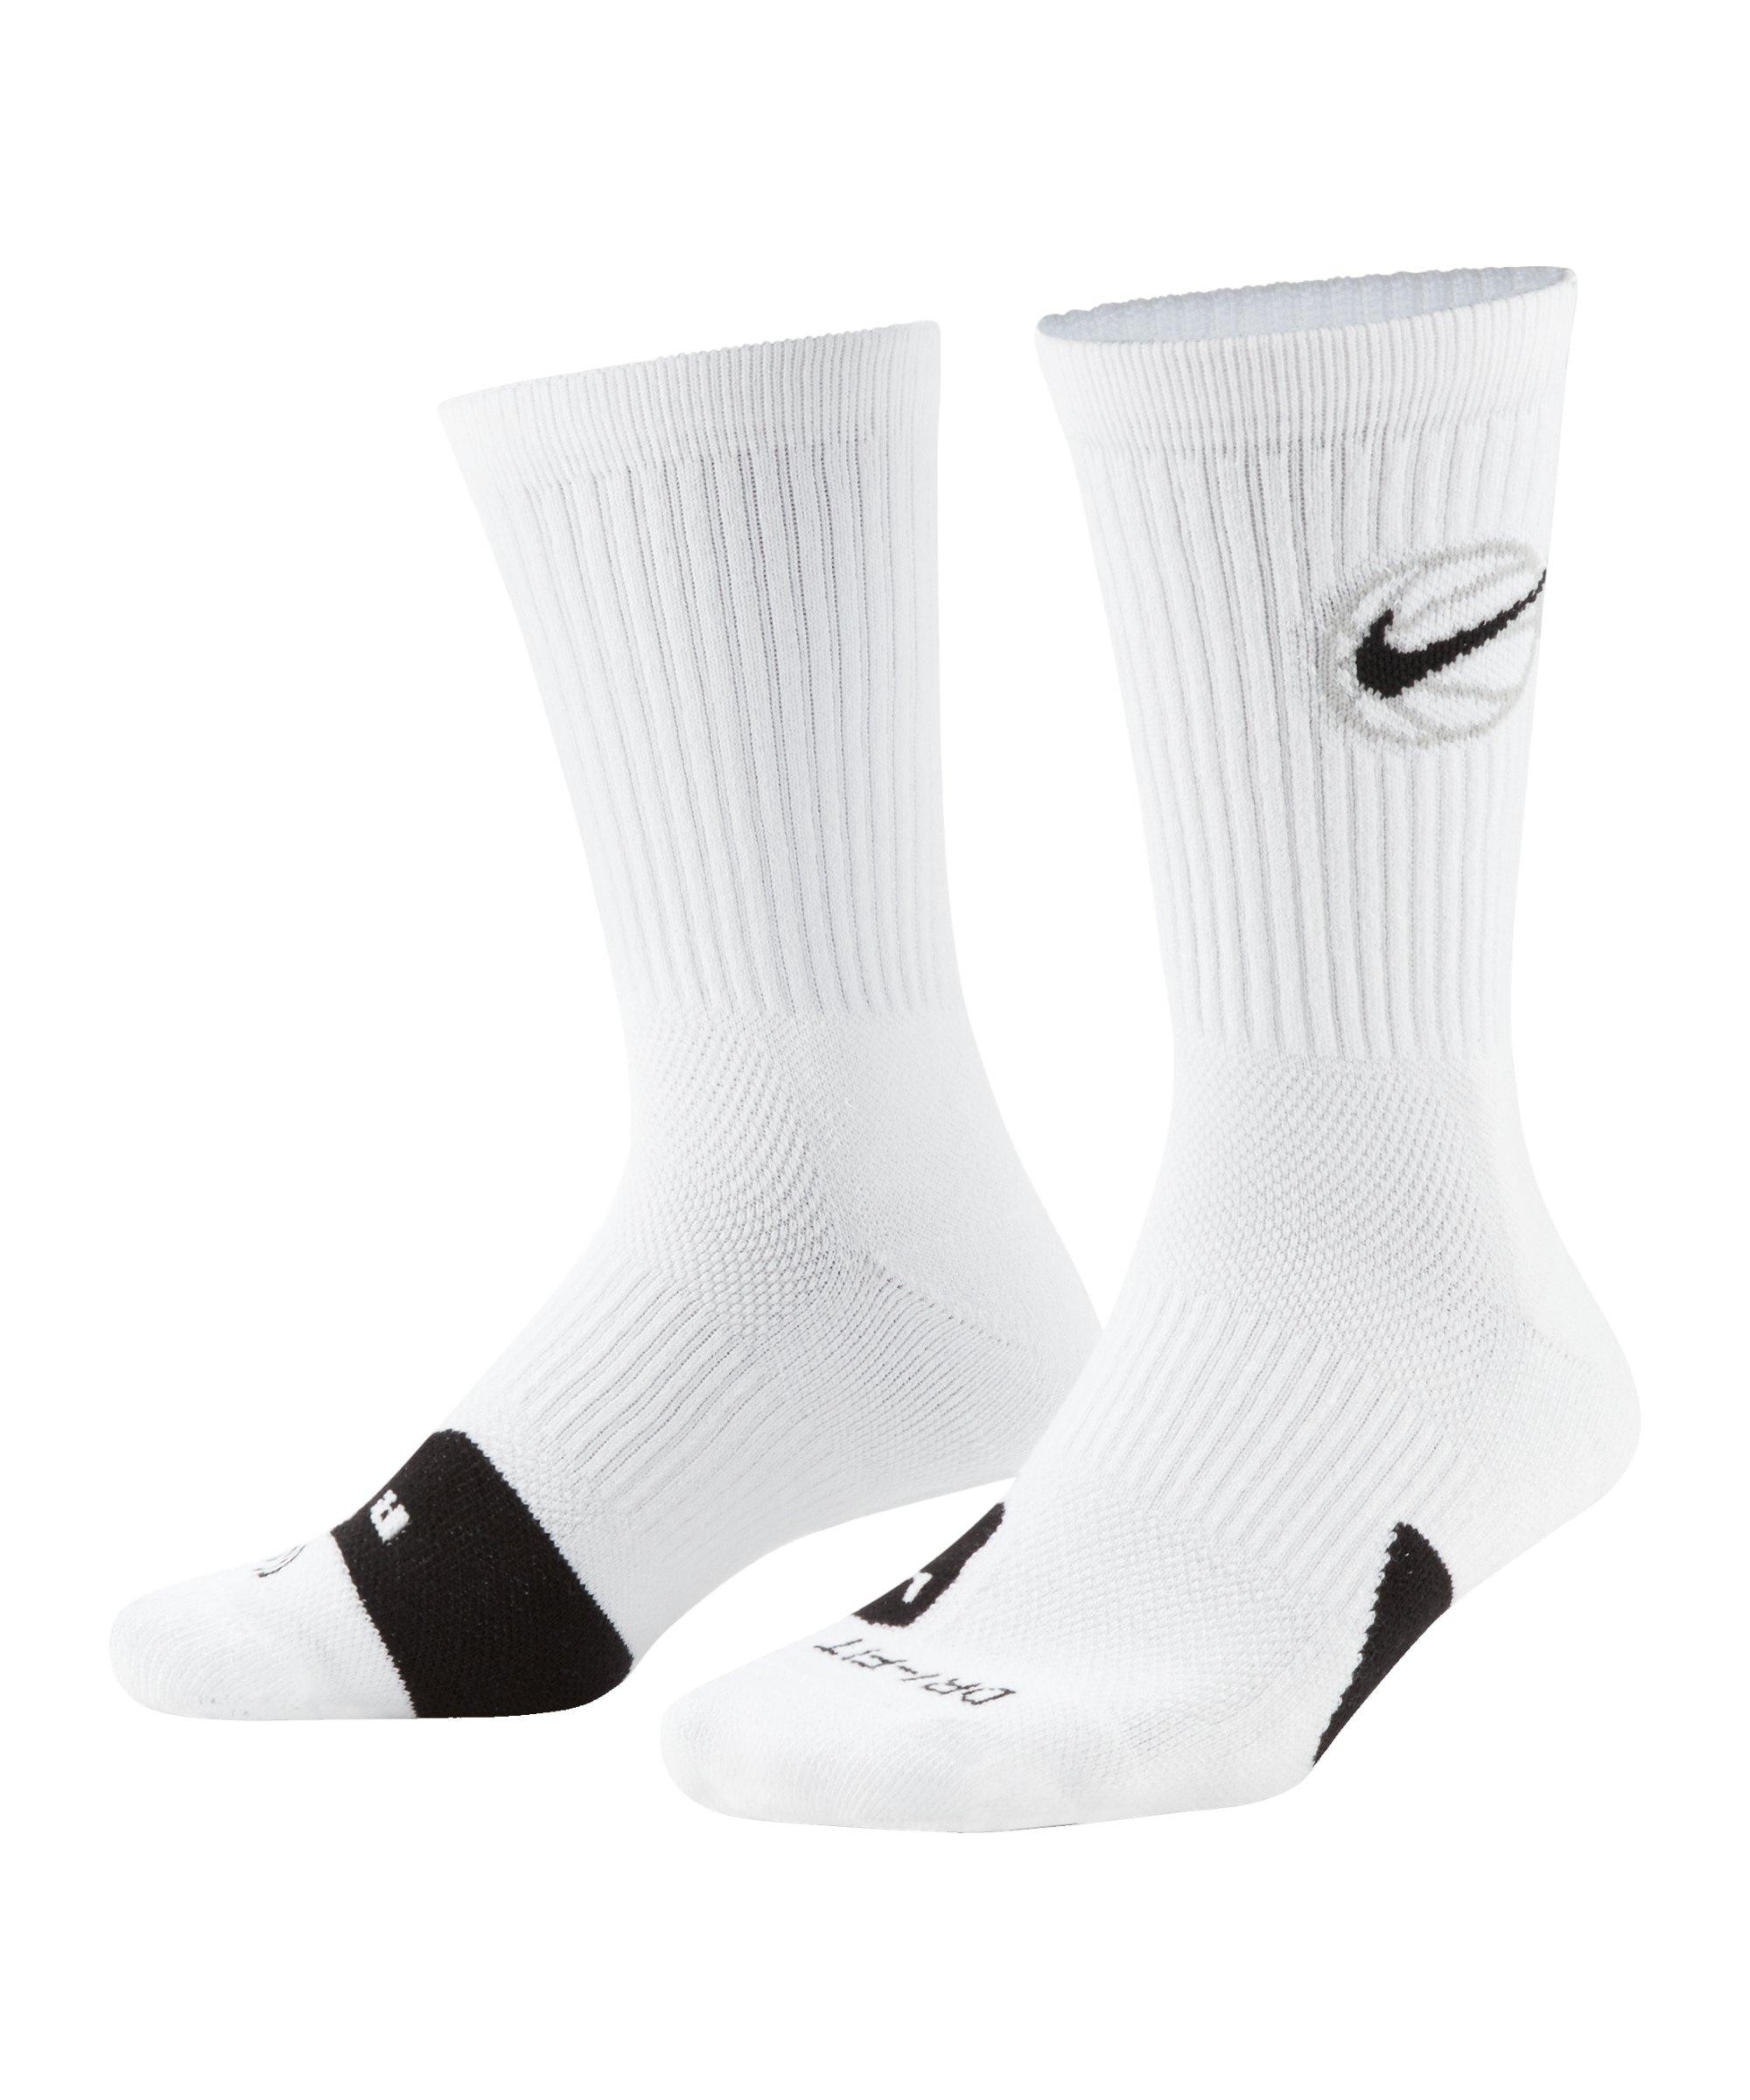 Nike Everyday Crew Socken Weiss Schwarz F100 - weiss